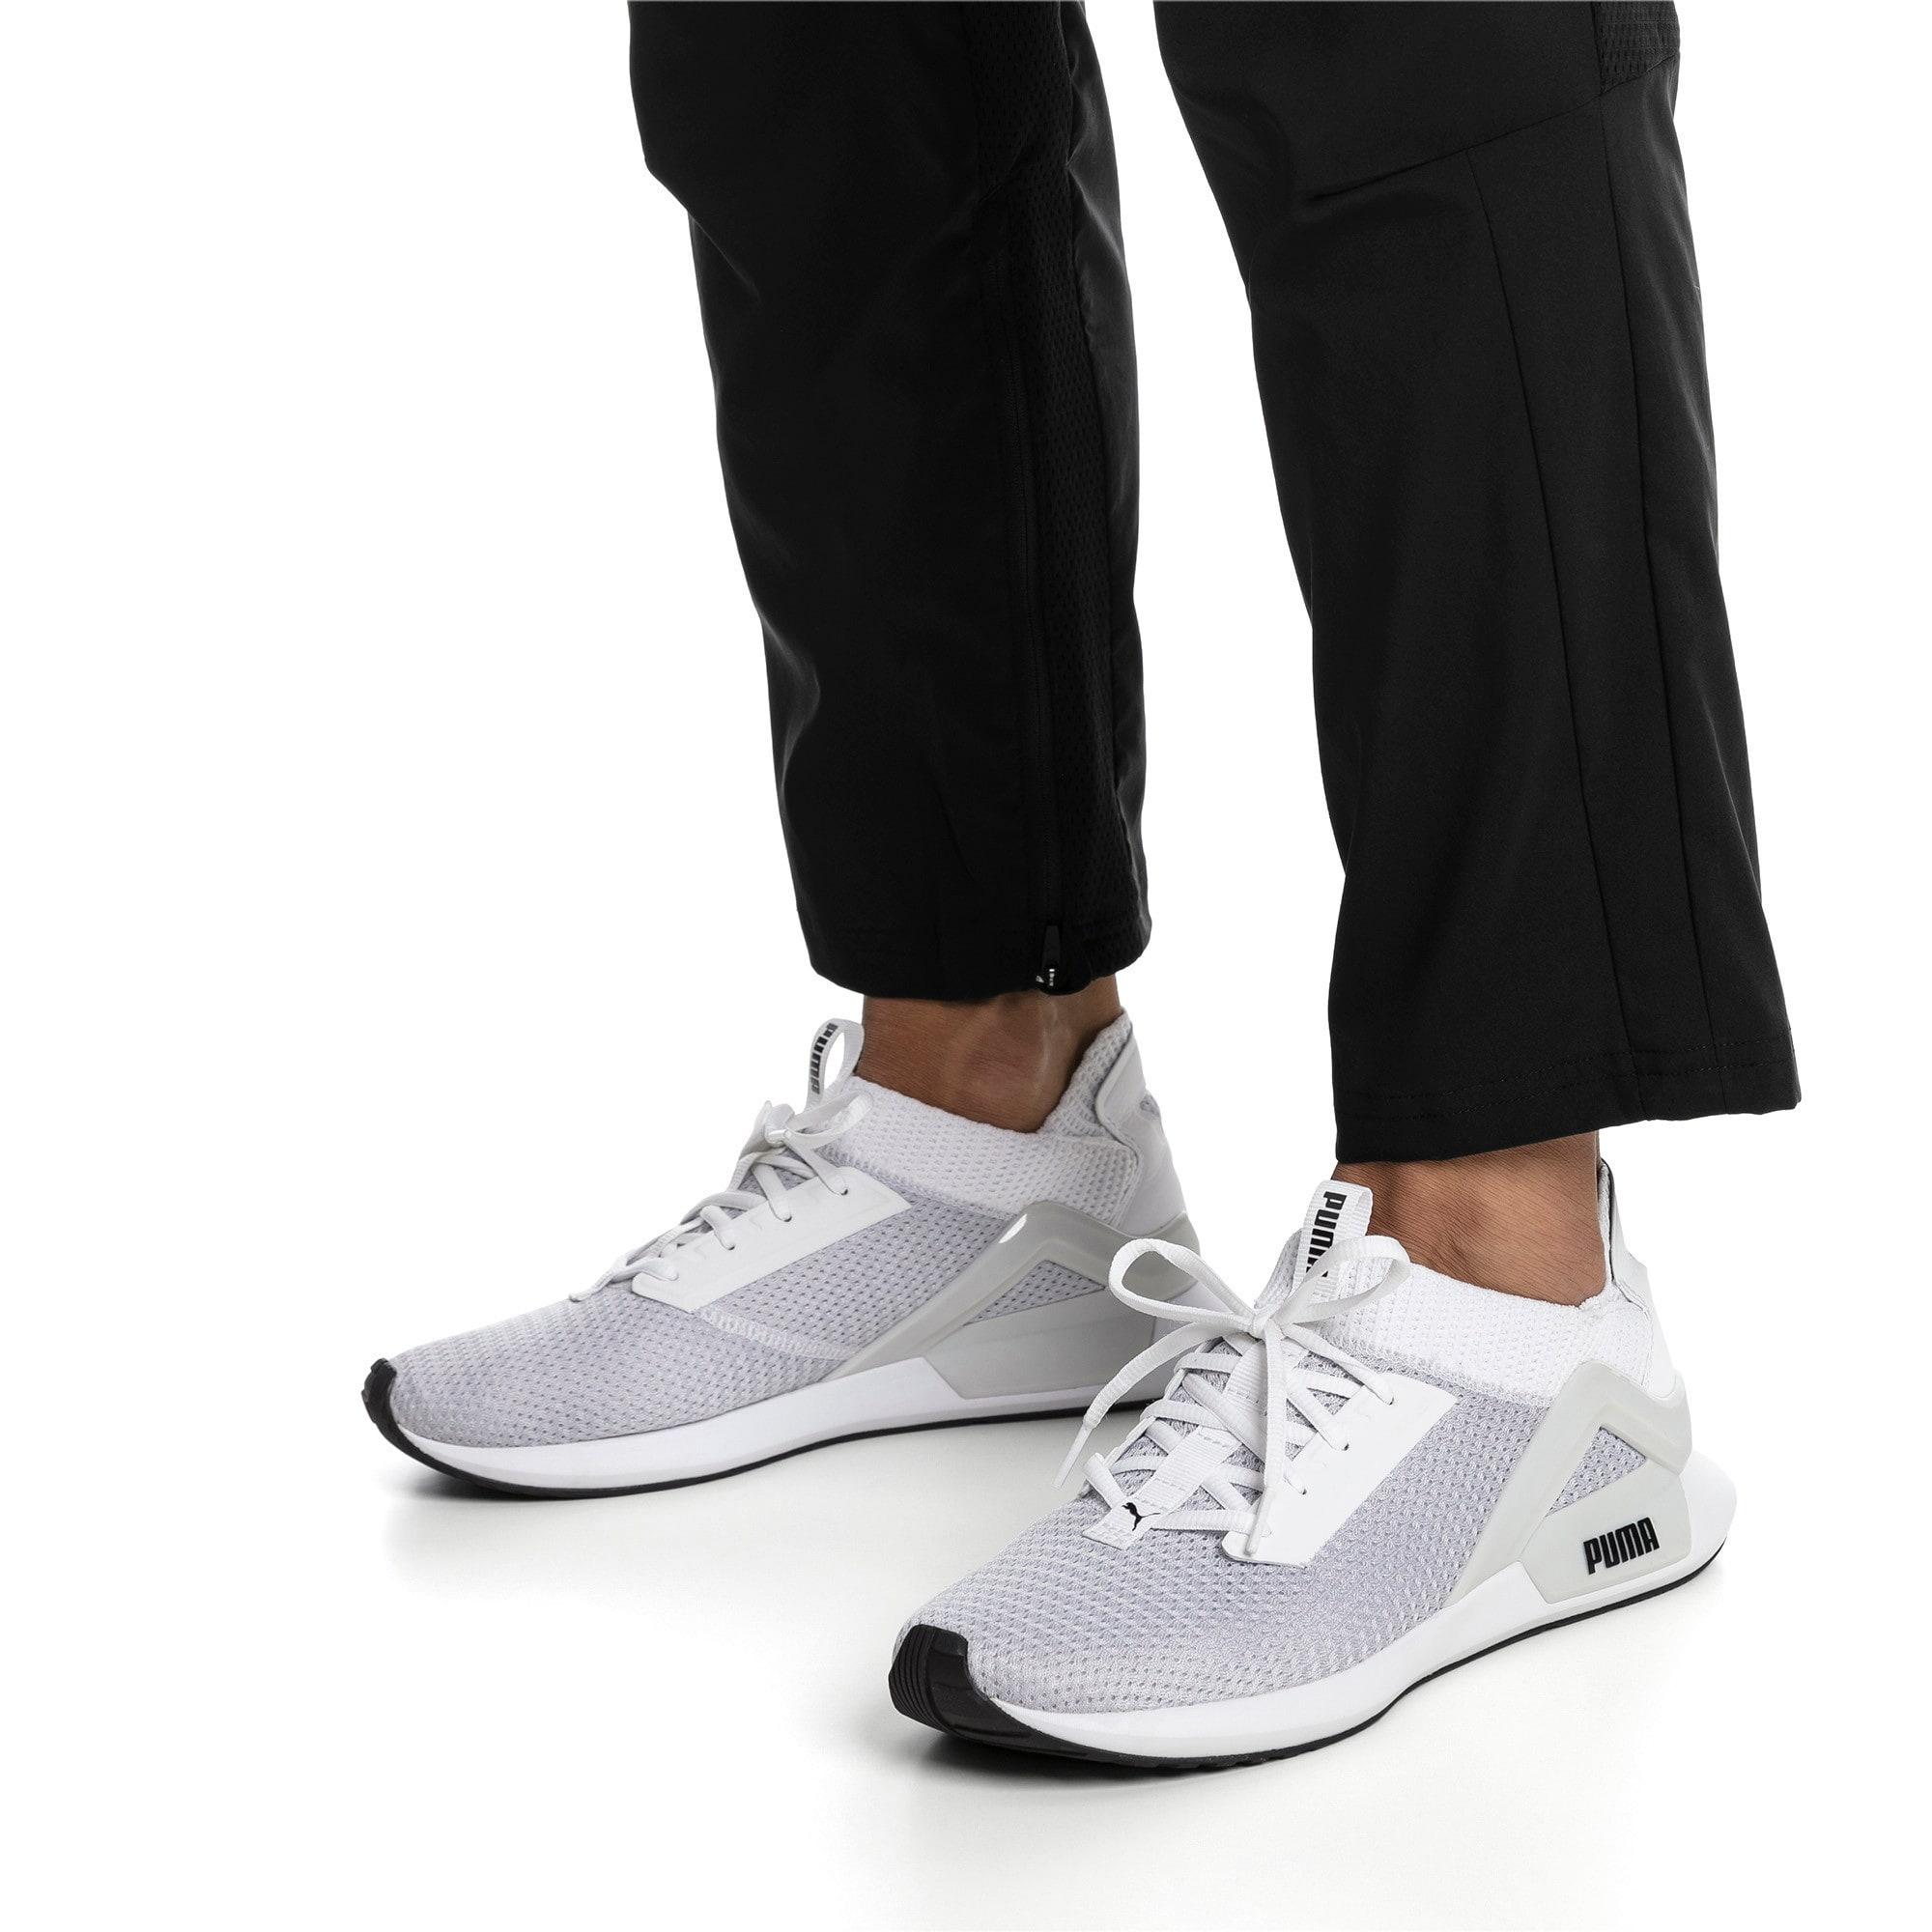 Thumbnail 7 of Rogue Men's Running Shoes, Puma White-Puma Black, medium